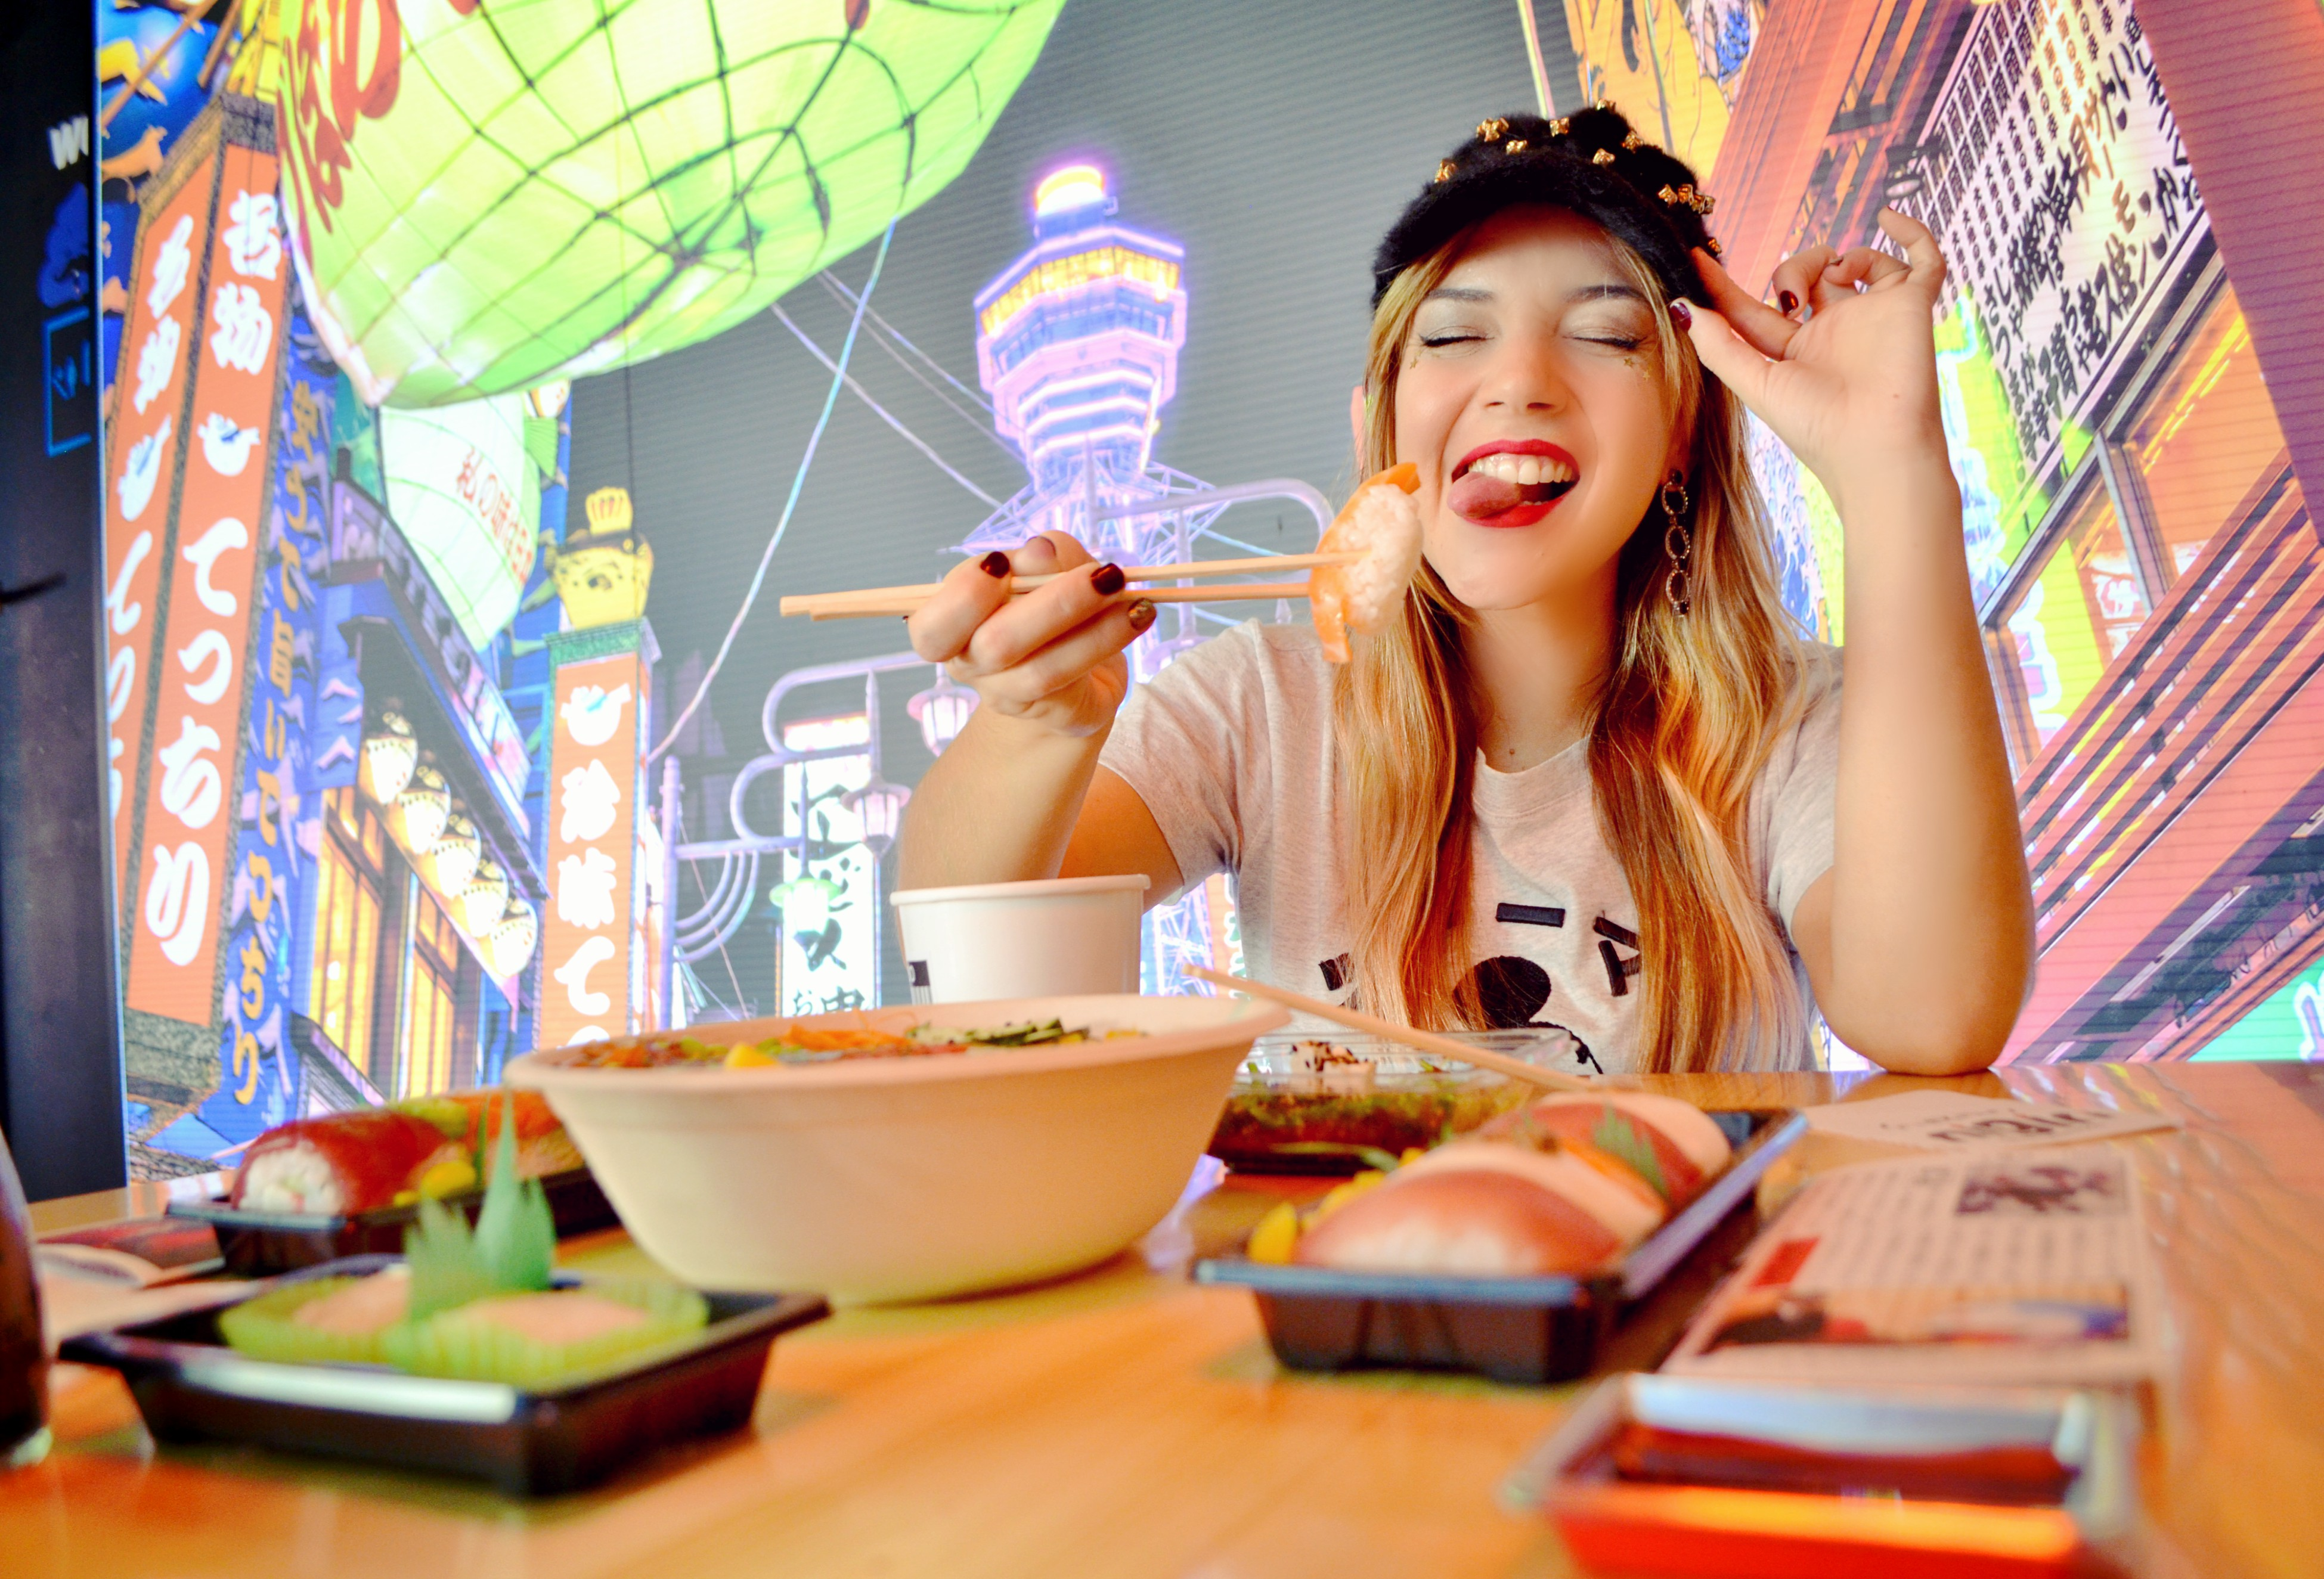 Nigiri-Madrid-blog-de-moda-ChicAdicta-influencer-Chic-Adicta-sushi-lover-fashionista-poke-bowl-Piensa-en-Chic-PiensaenChic